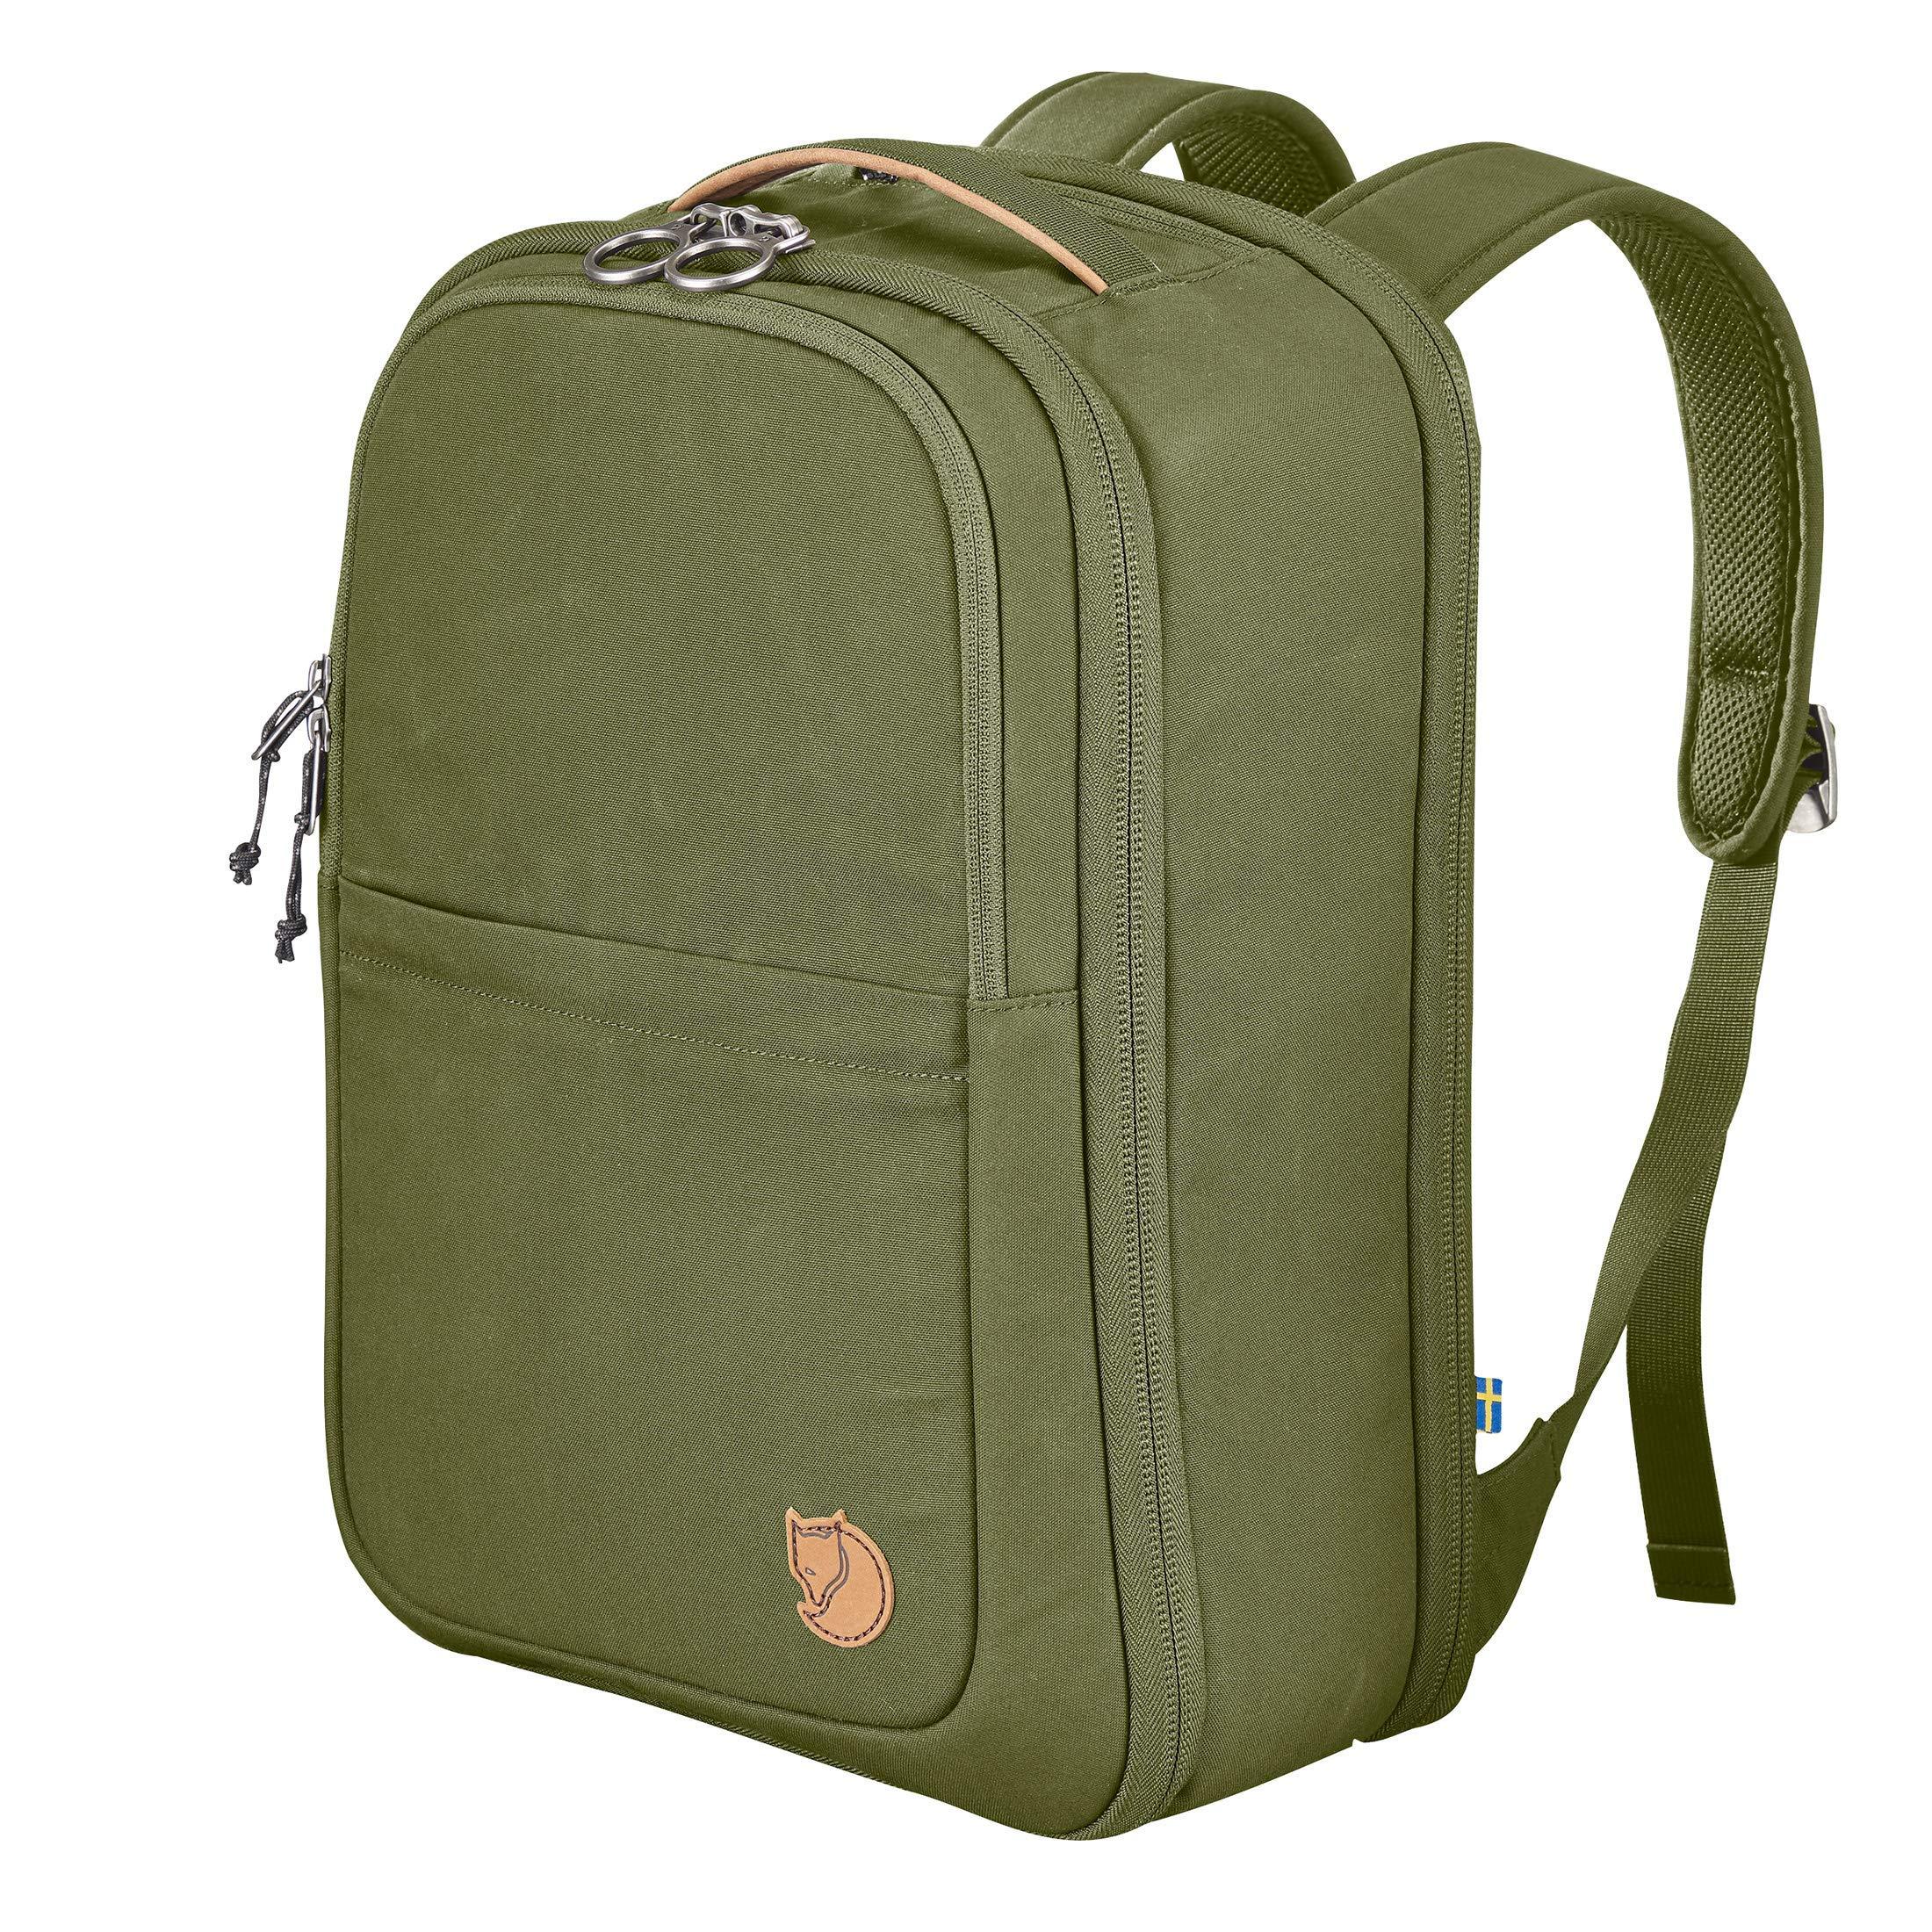 Fjallraven Men's Travel Pack Small Bag, Green, One Size